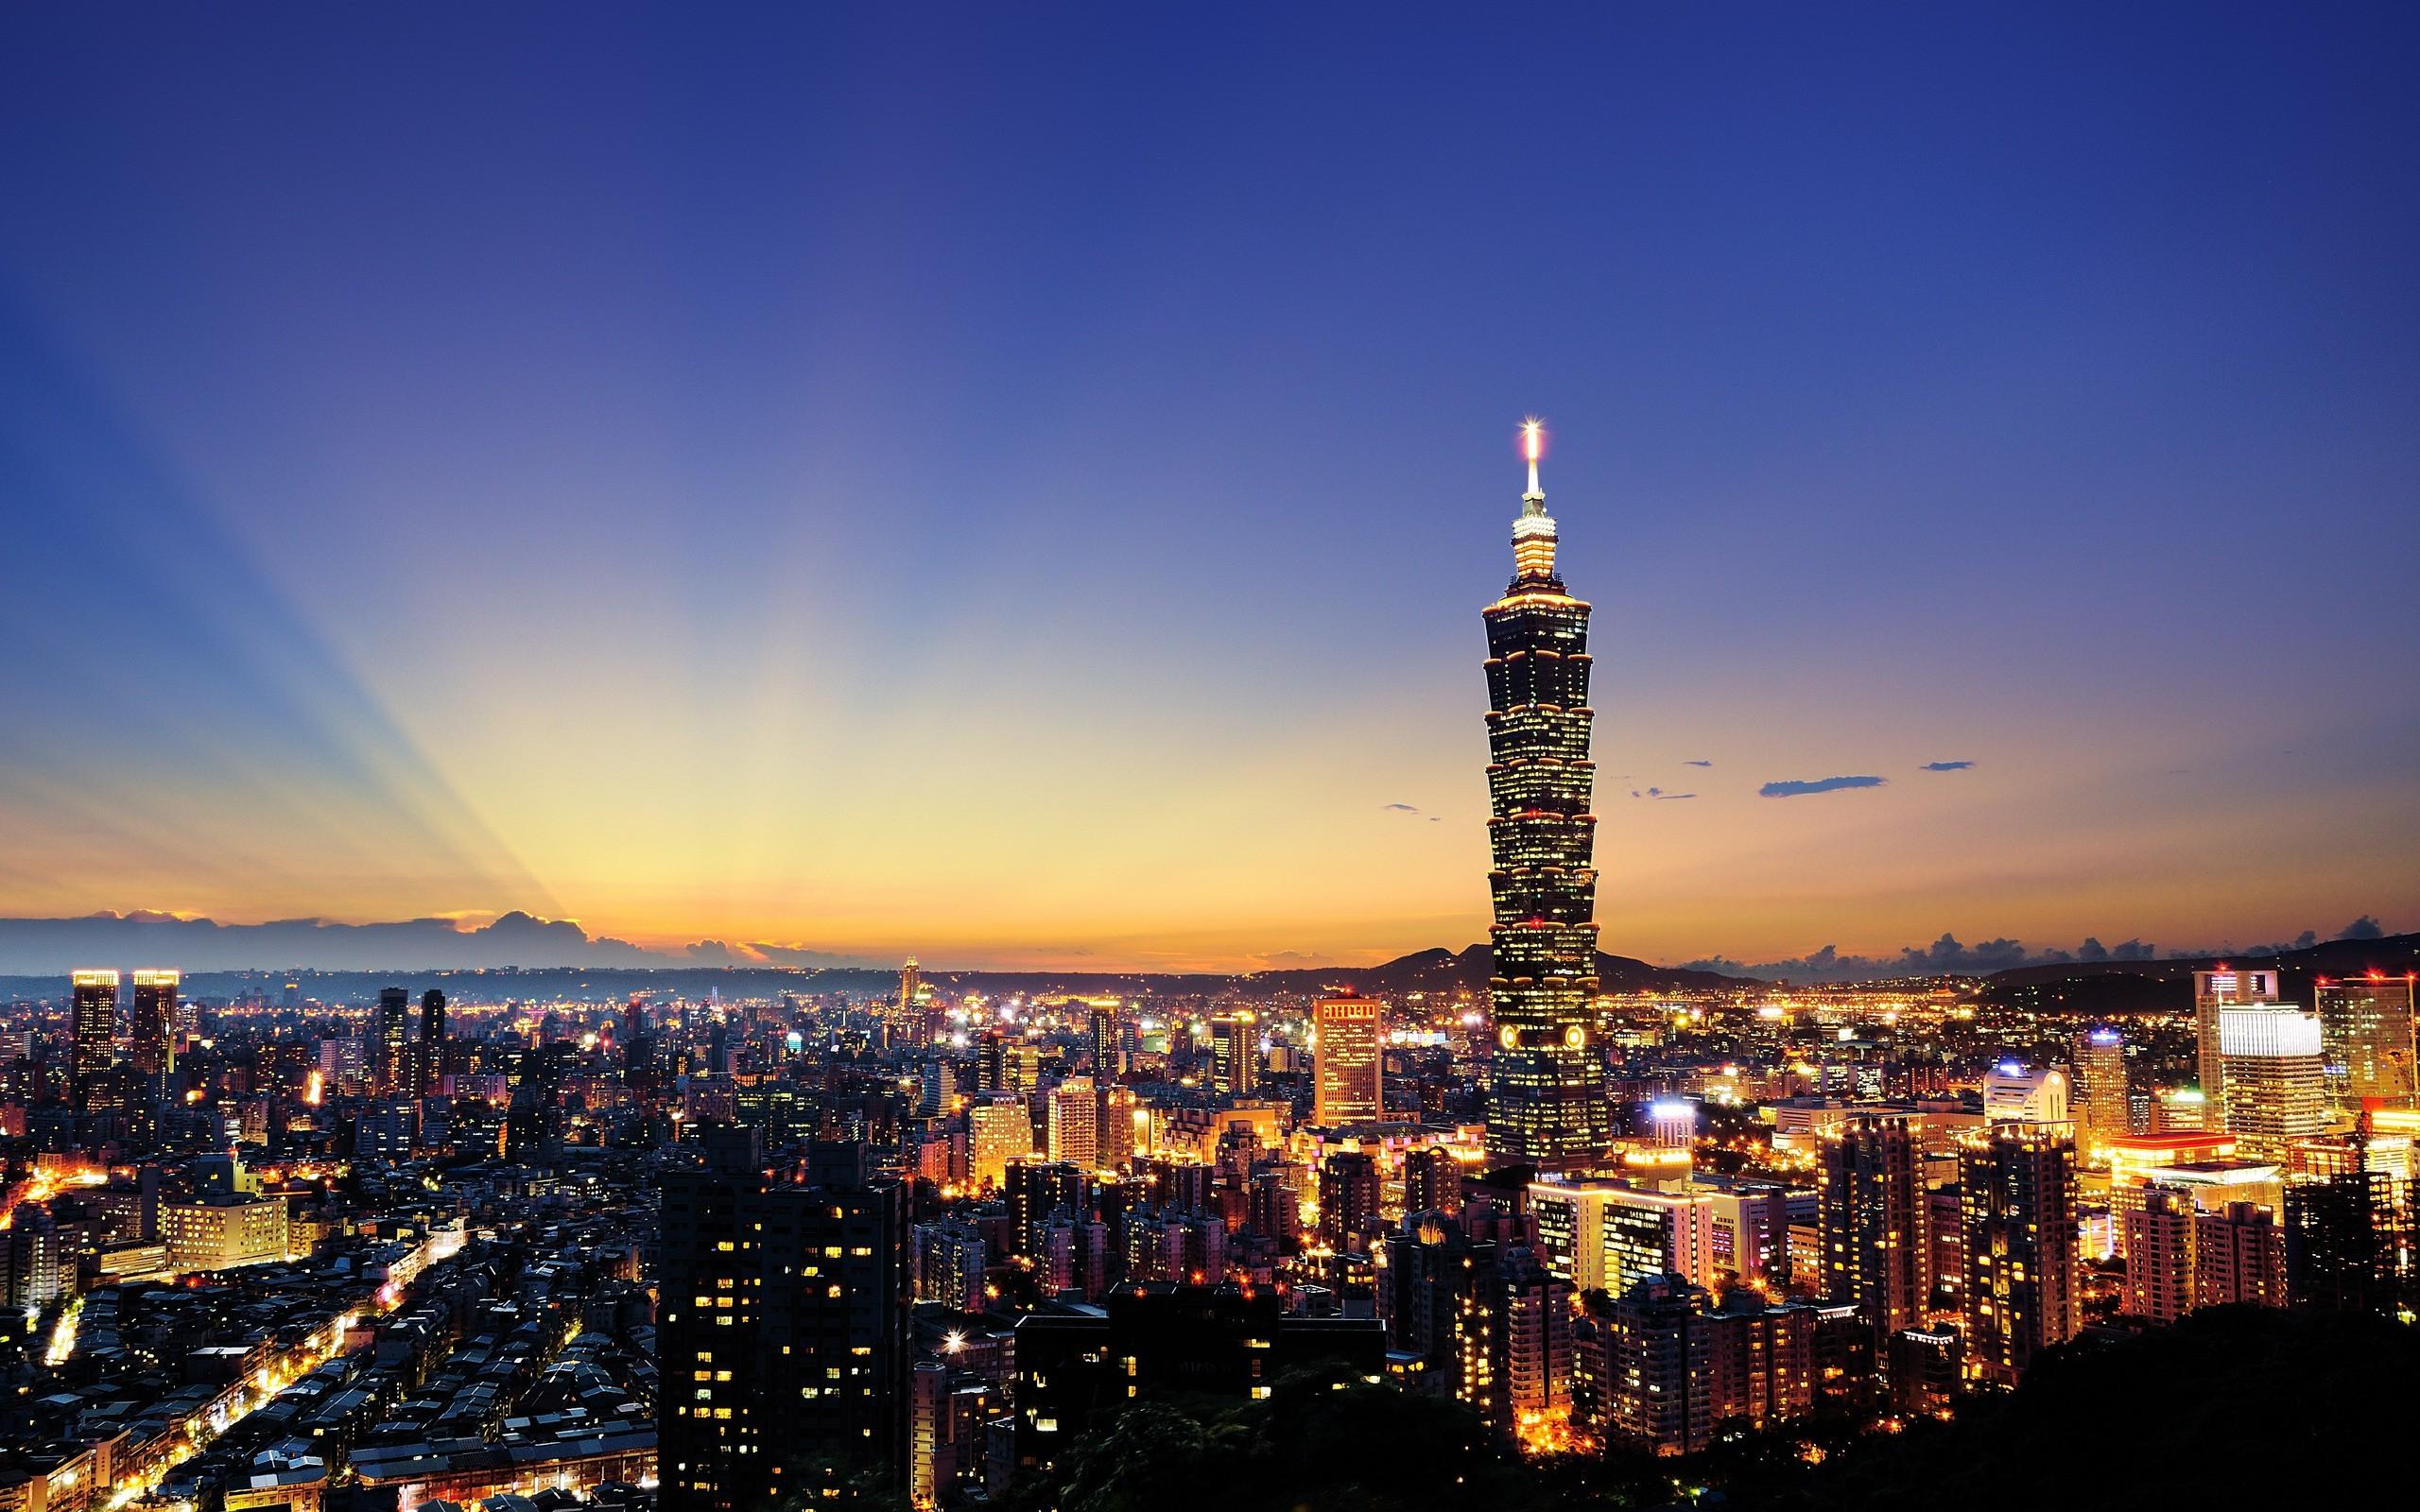 wallpaper cityscapes · skylines · city skyline